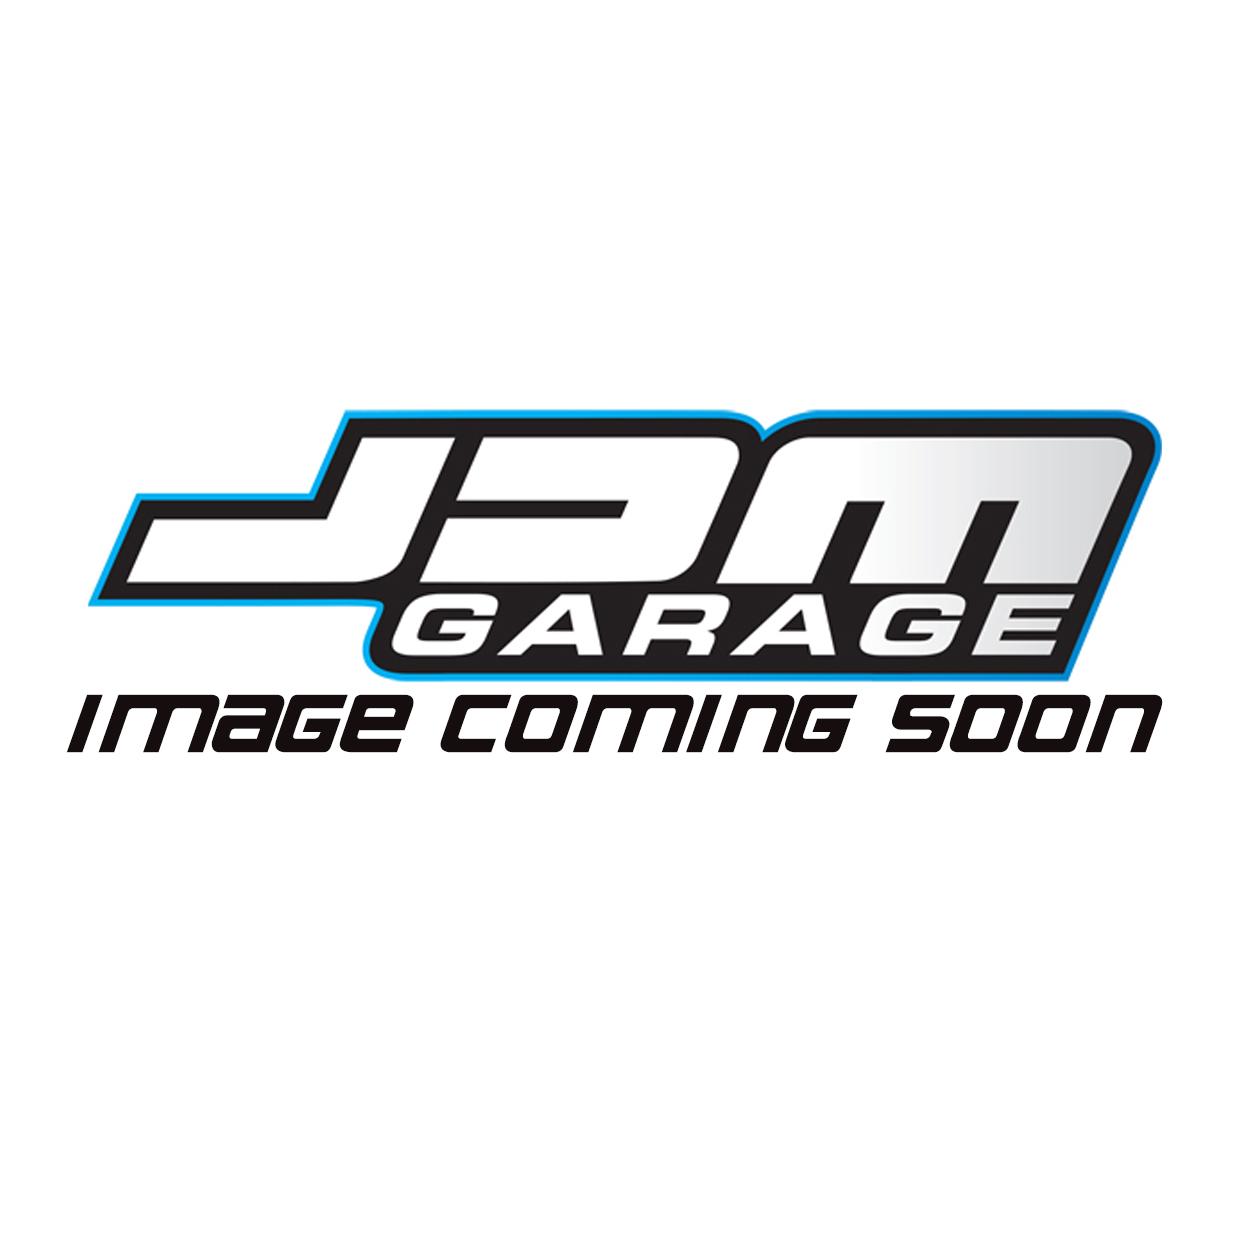 Genuine Toyota Oil Filter Union for Chaser GX100 Altezza GXE10 SXE10 Celica ST182 ST205 MR2 SW20 90404-19002